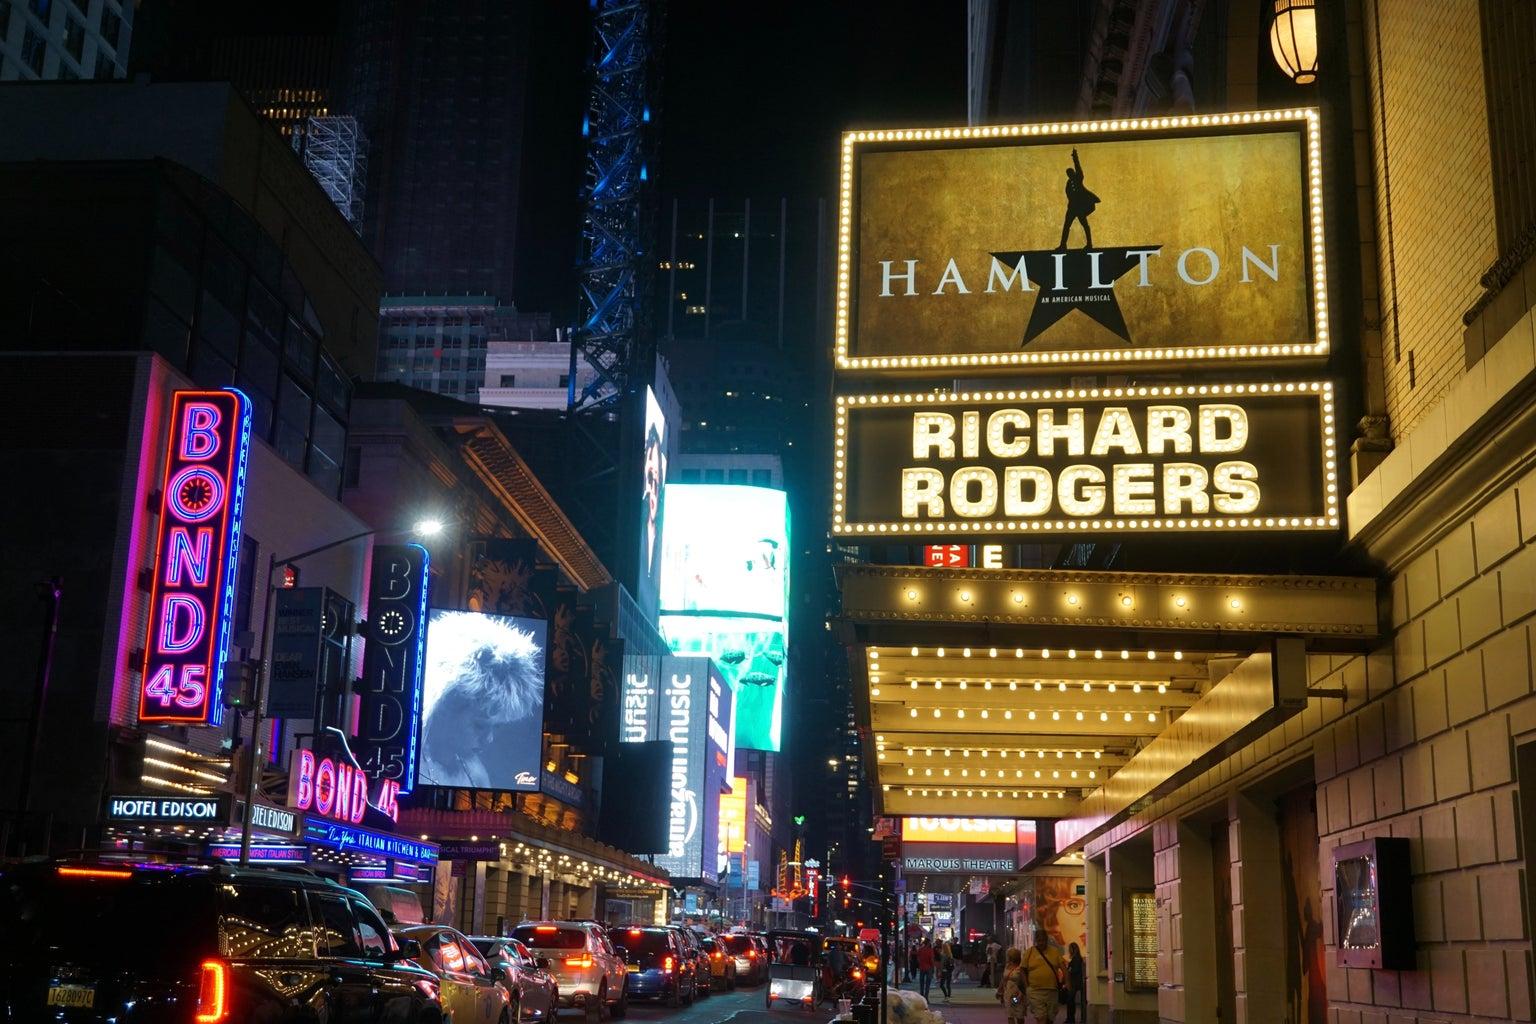 Hamilton Richard Rodgers Theatre NYC